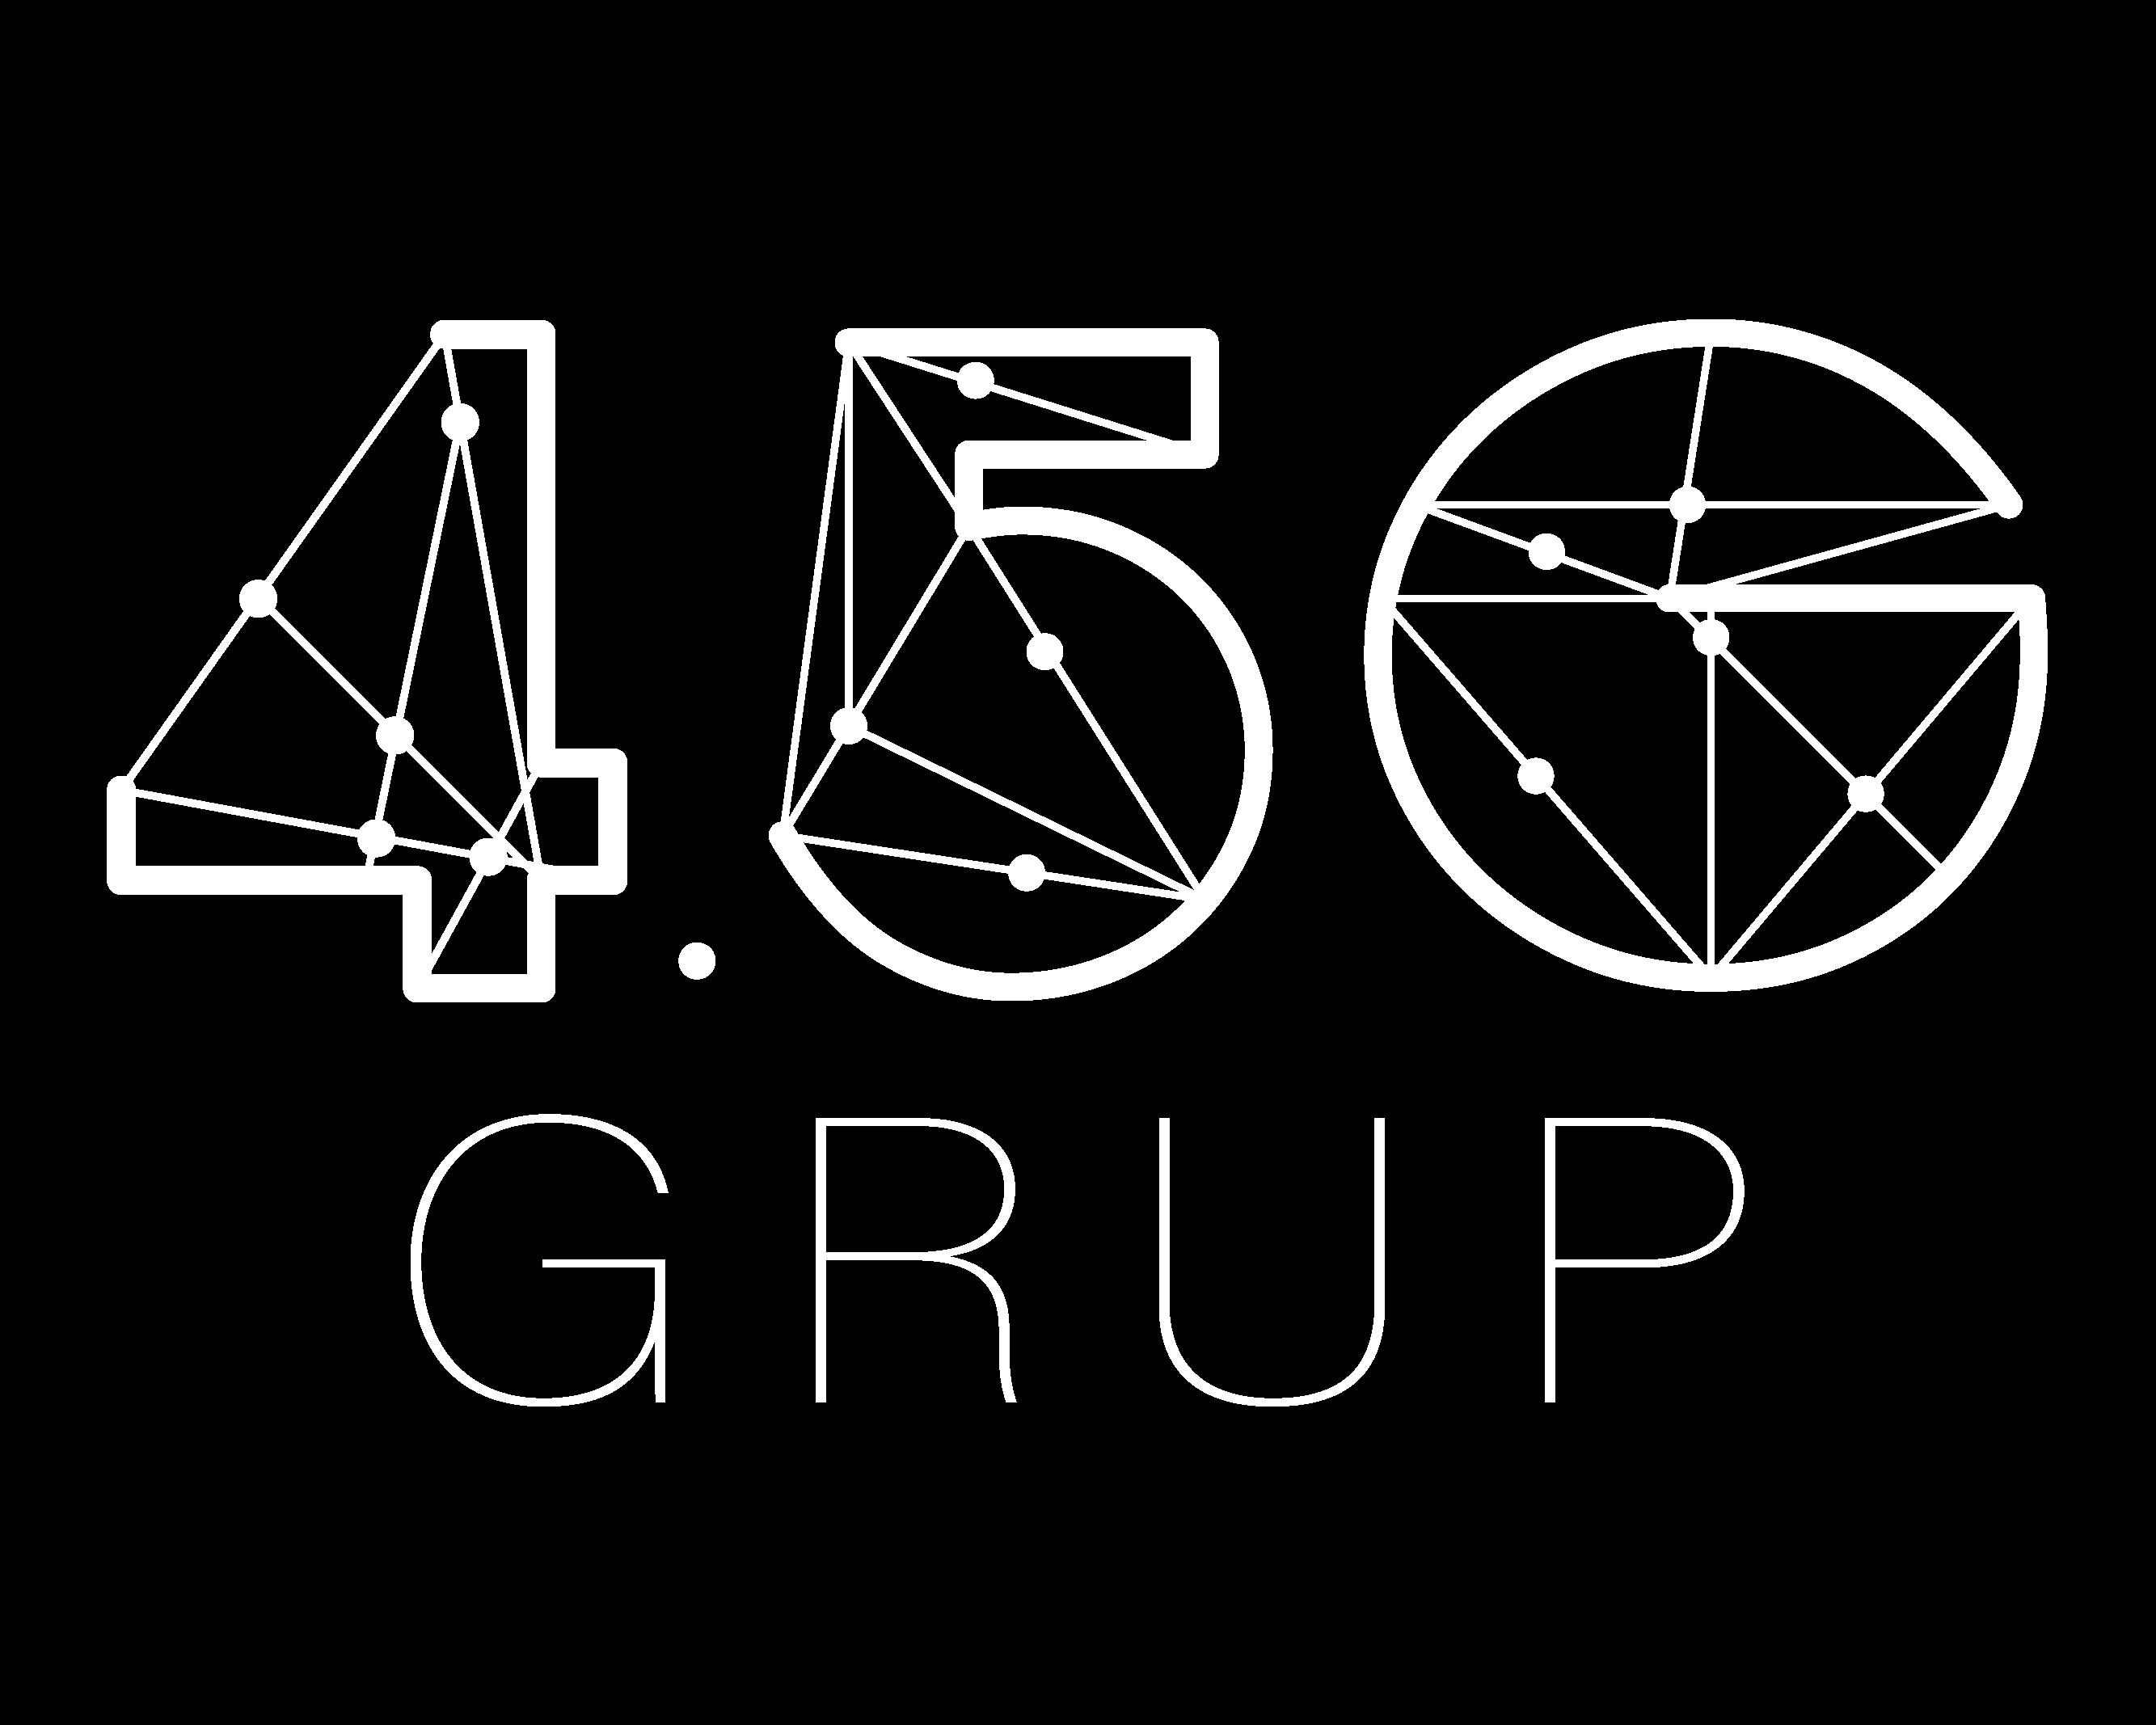 45G_Grup_Logo_Beyaz